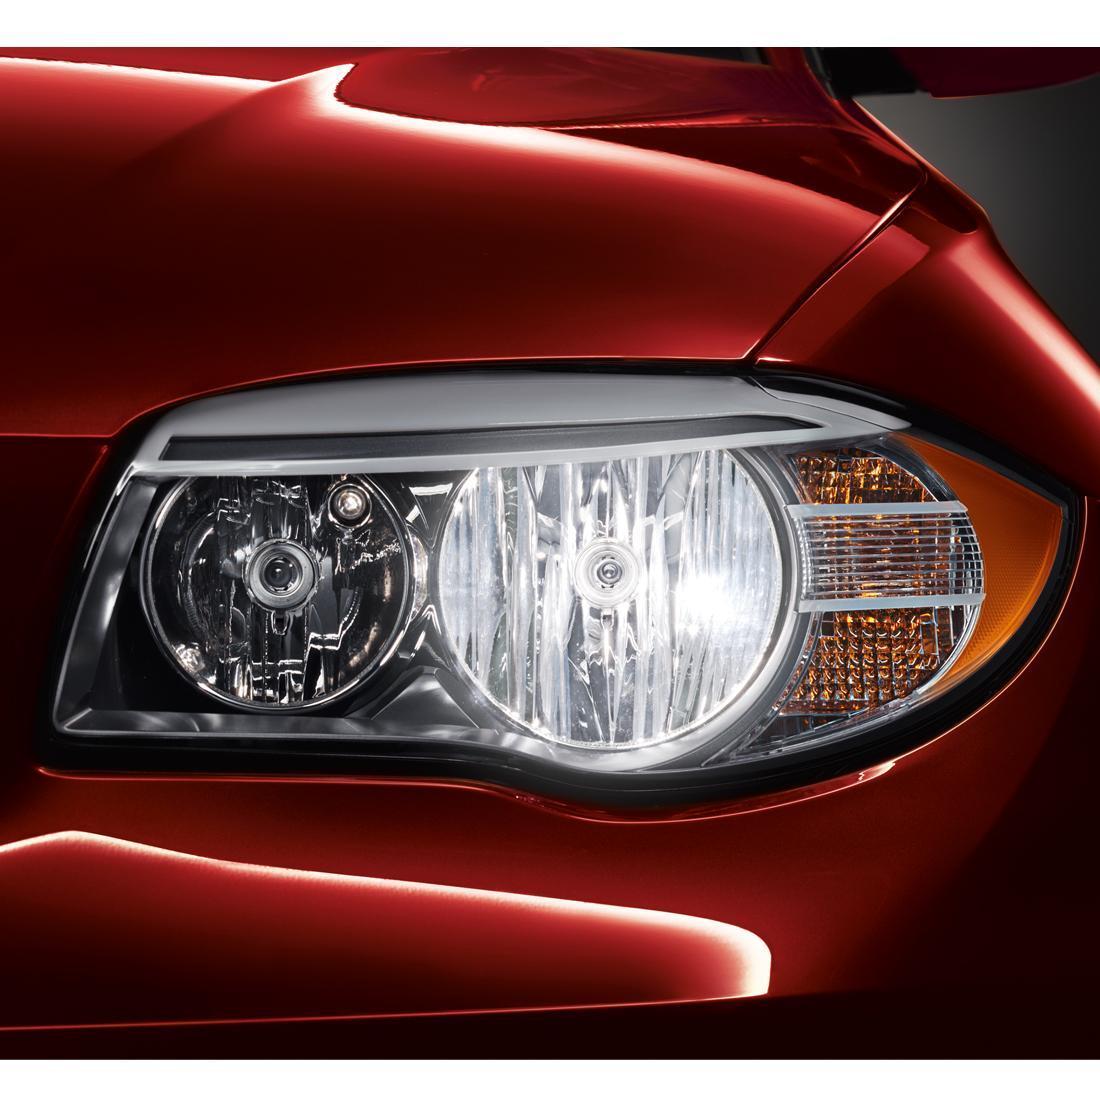 BMW 328d Bmw High Performance Light Bulbs. Gas, Possible